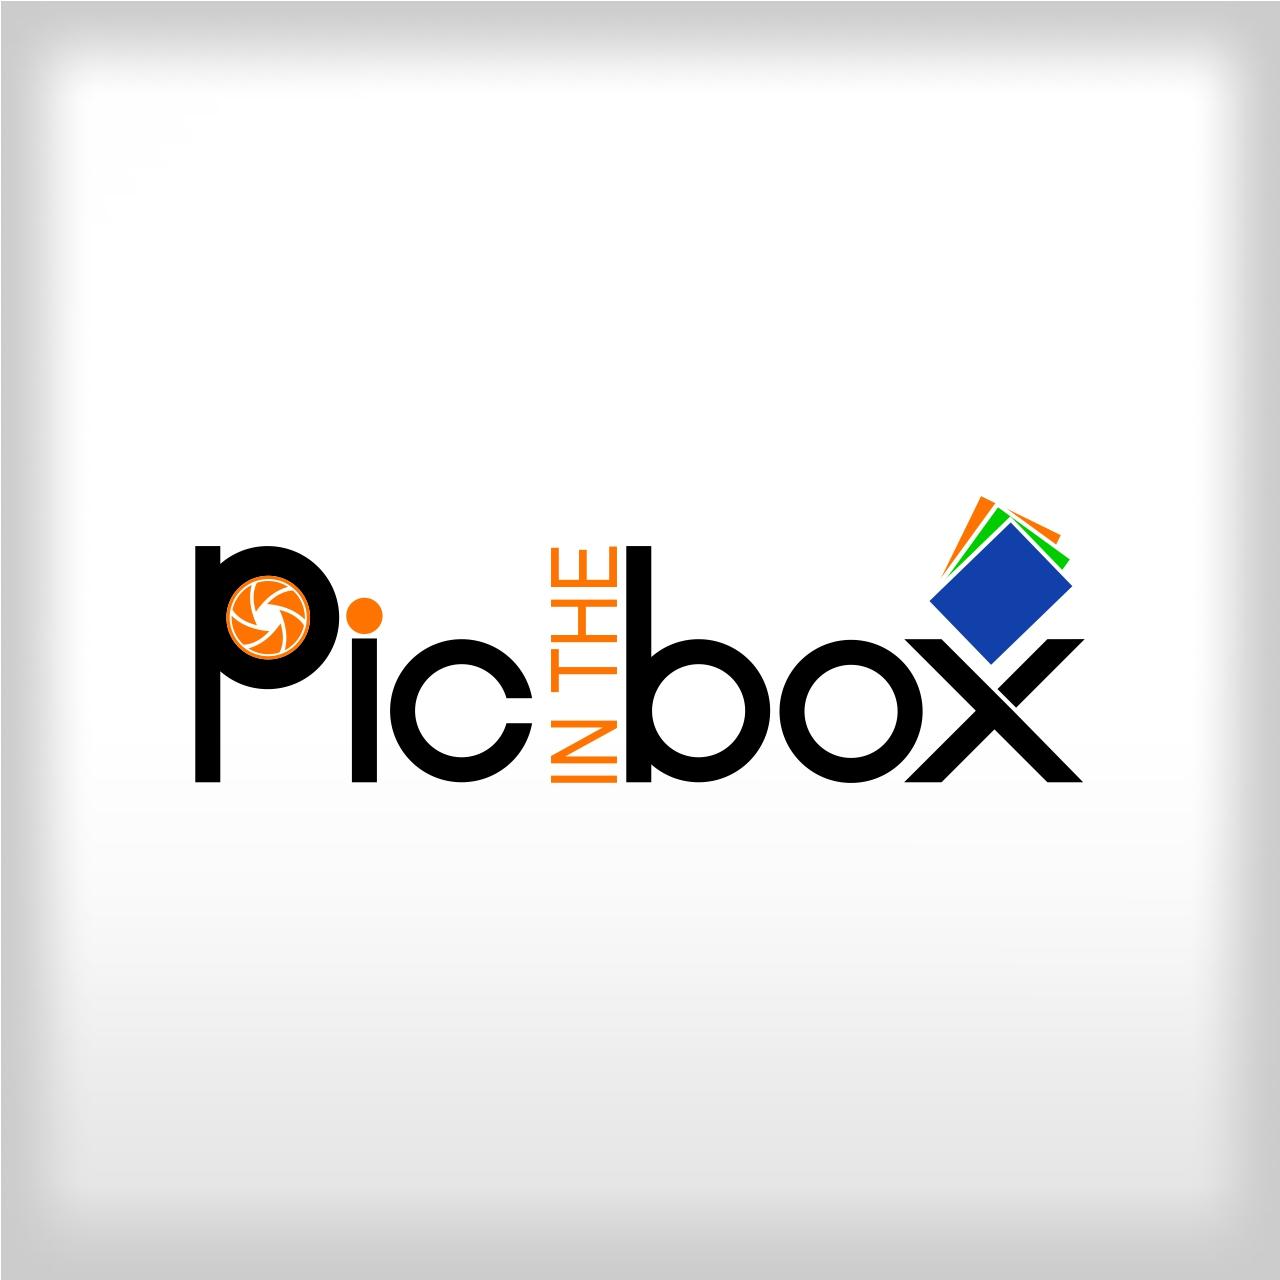 Free Photography Logo Designs  DesignEvo Logo Maker